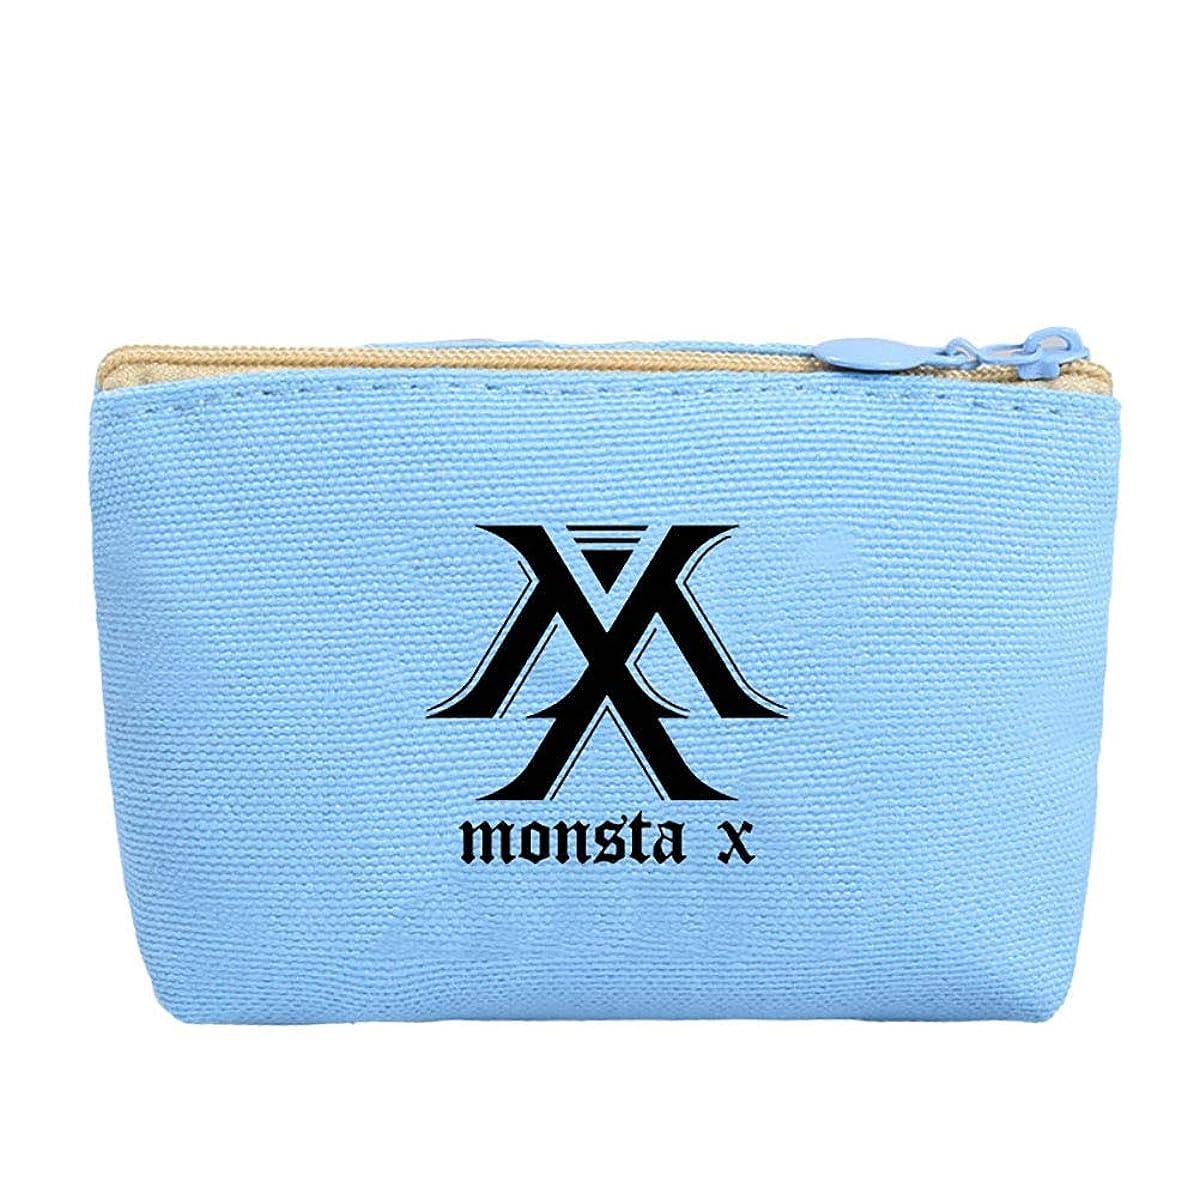 Youyouchard Kpop GOT7 MONSTA X SEVENTEEN Canvas Pencil Case Stationery Bag Pencil Box Coin Bag Cosmetic Bag Charm Zipper Pouch Wallet K-Pop Fans Bags(MONSTA X(blue))